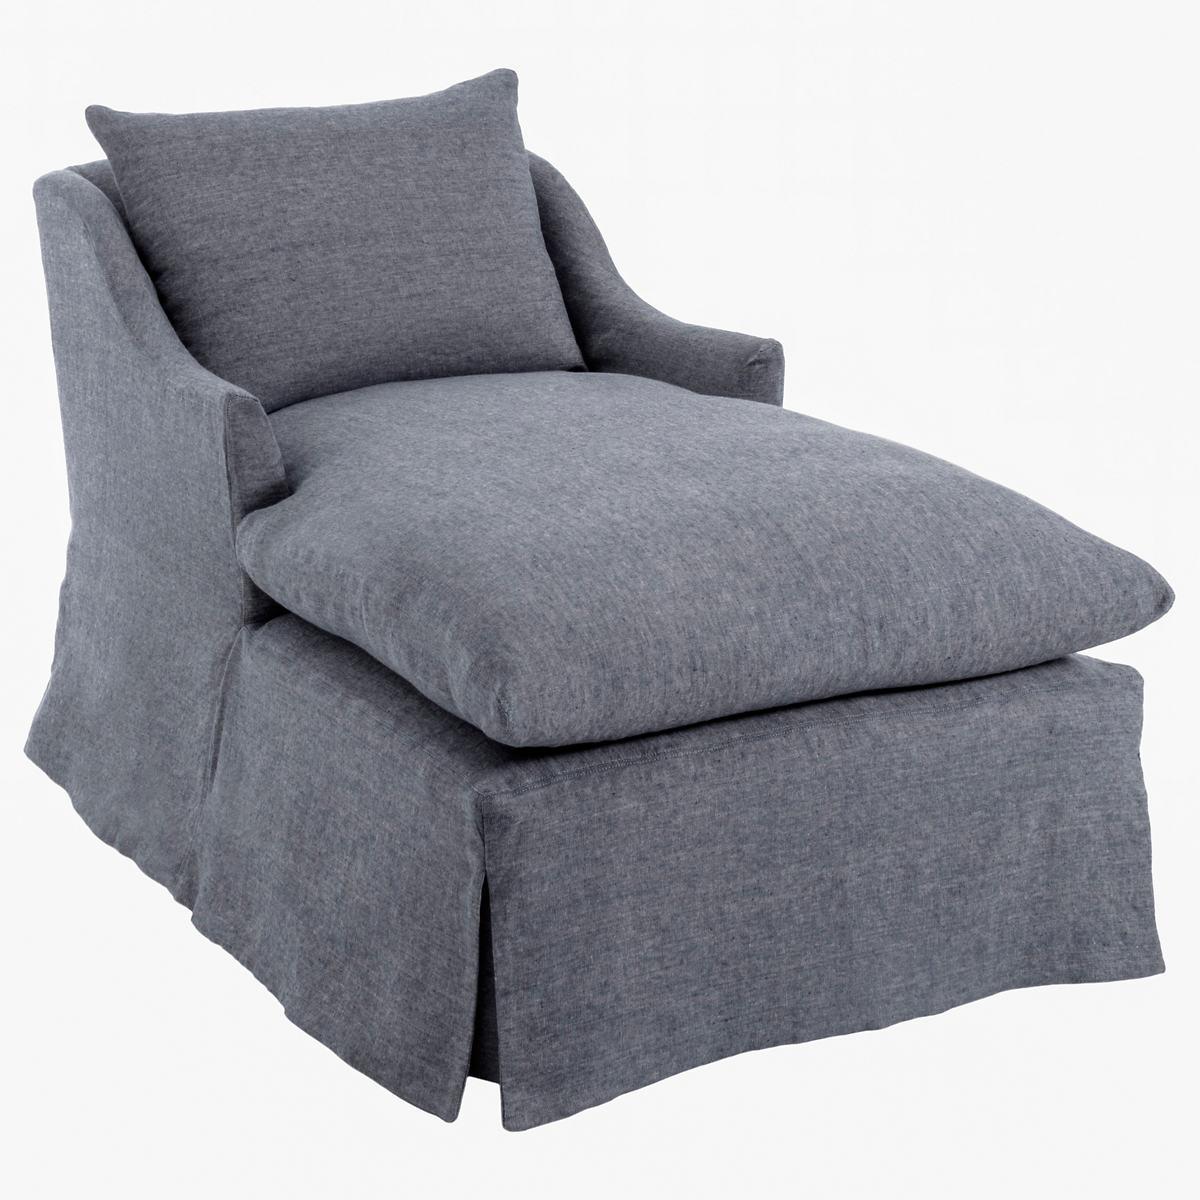 Weathered Linen Chambray Namaste Slipcovered Chaise